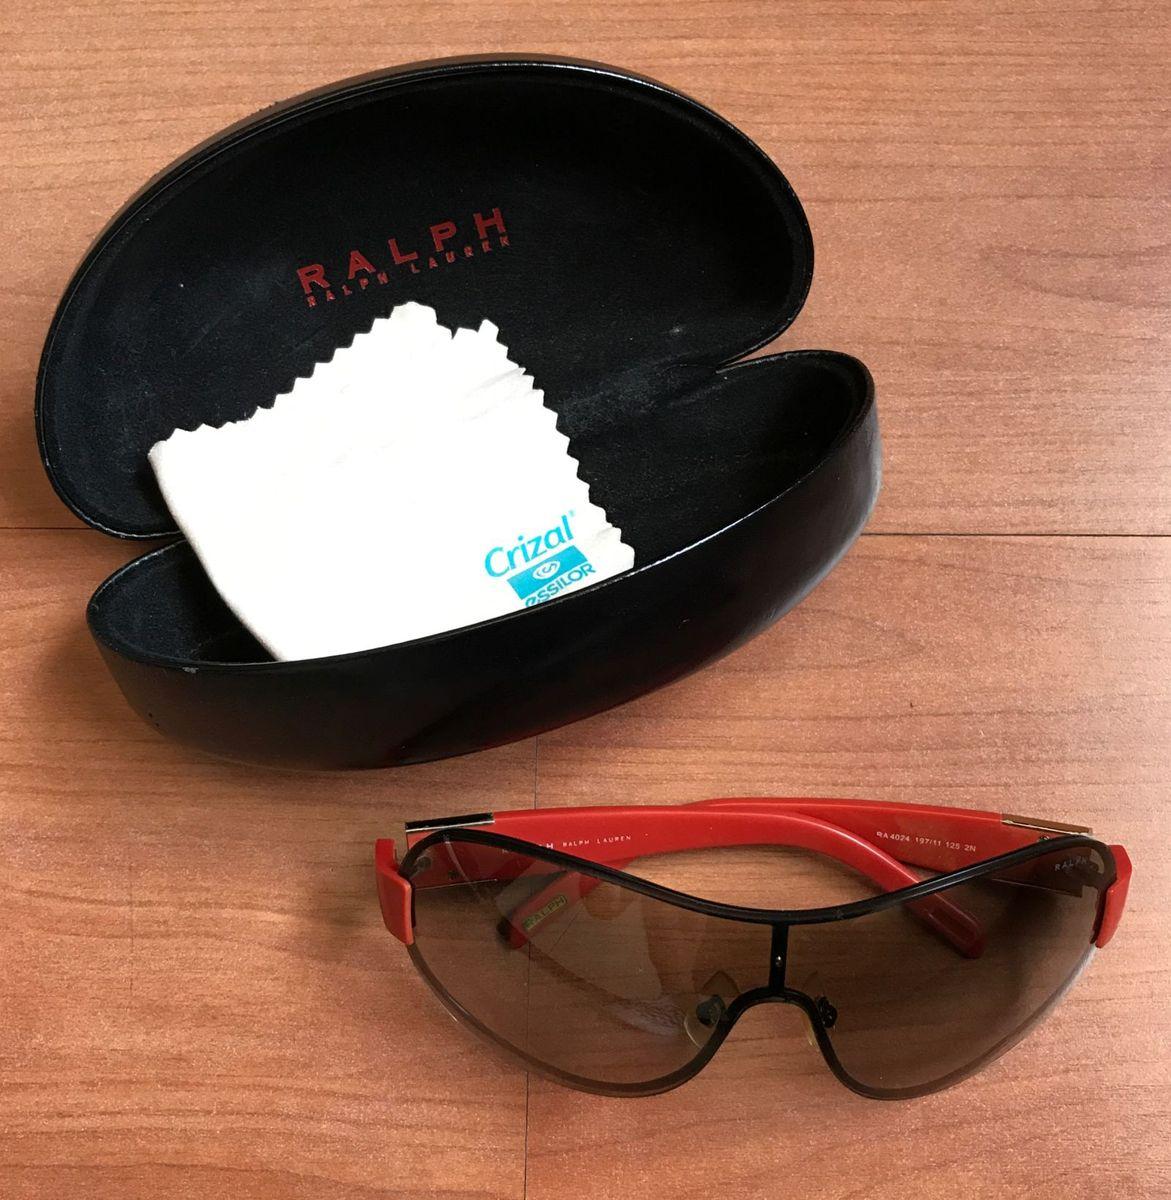 56d2e54ee0b8a óculos de sol ralph lauren - óculos ralph lauren.  Czm6ly9wag90b3muzw5qb2vplmnvbs5ici9wcm9kdwn0cy8ymzq3ndcvnte3nddjowrkytlmmwi1mwfiymyzmzywnzuwzgzjowiuanbn  ...